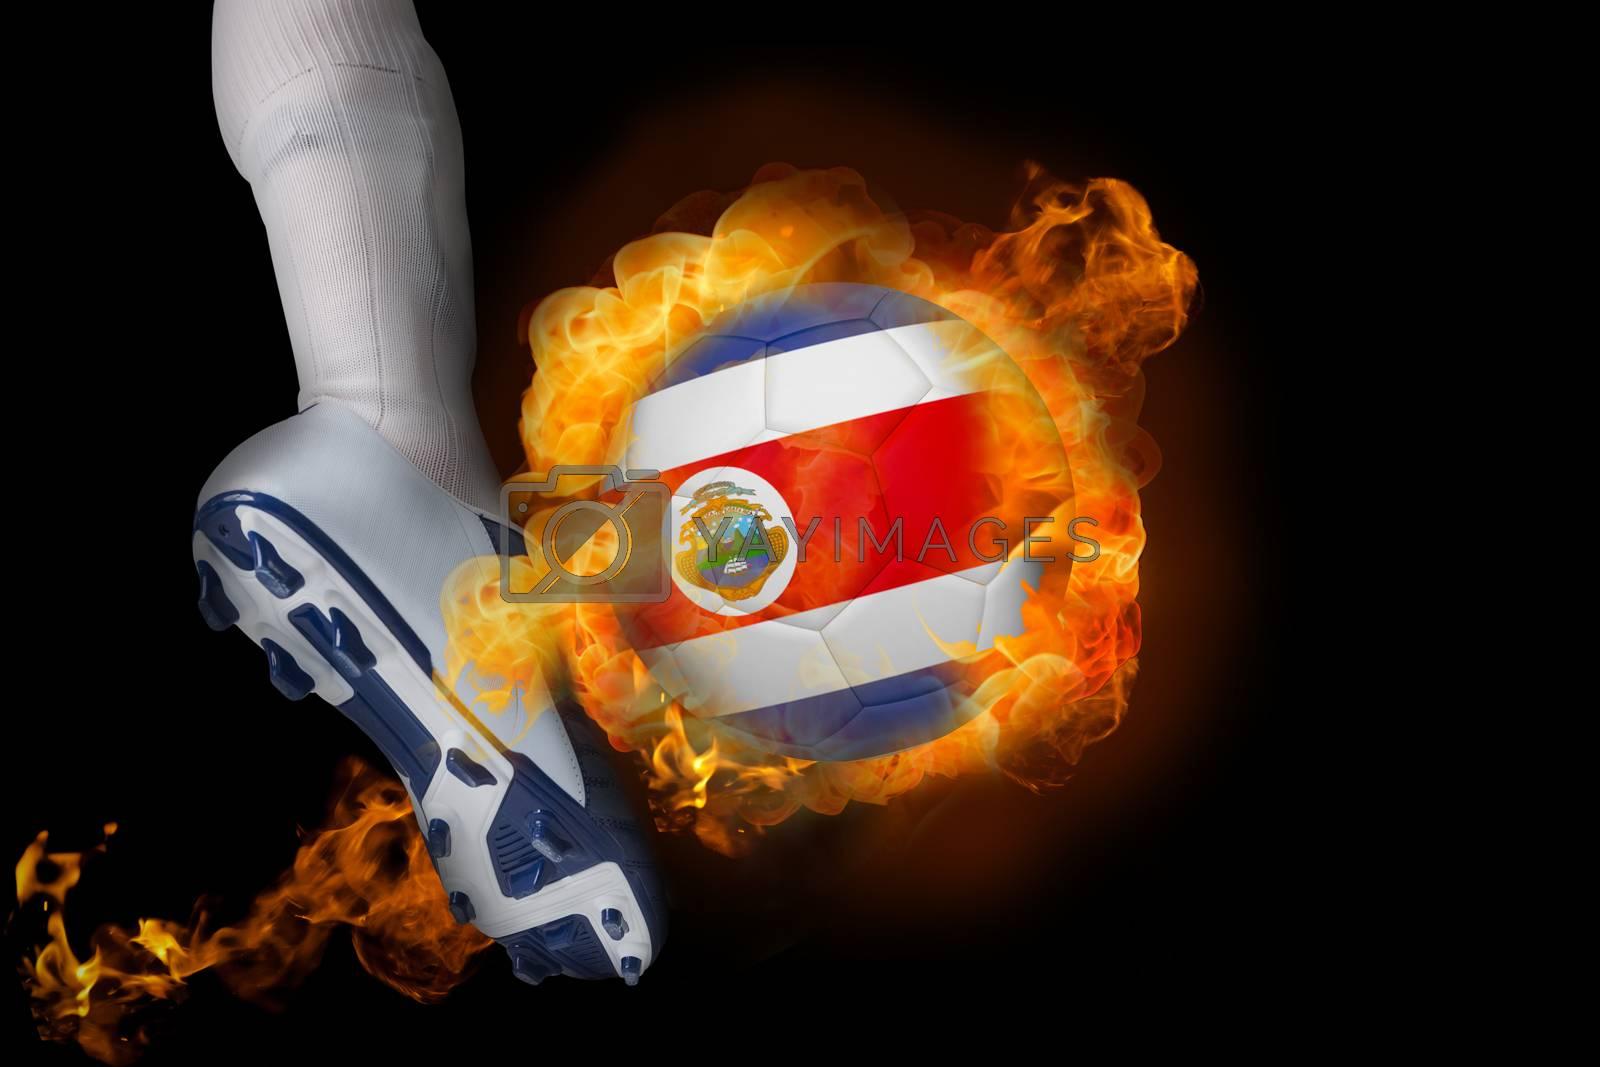 Football player kicking flaming costa rica ball by Wavebreakmedia